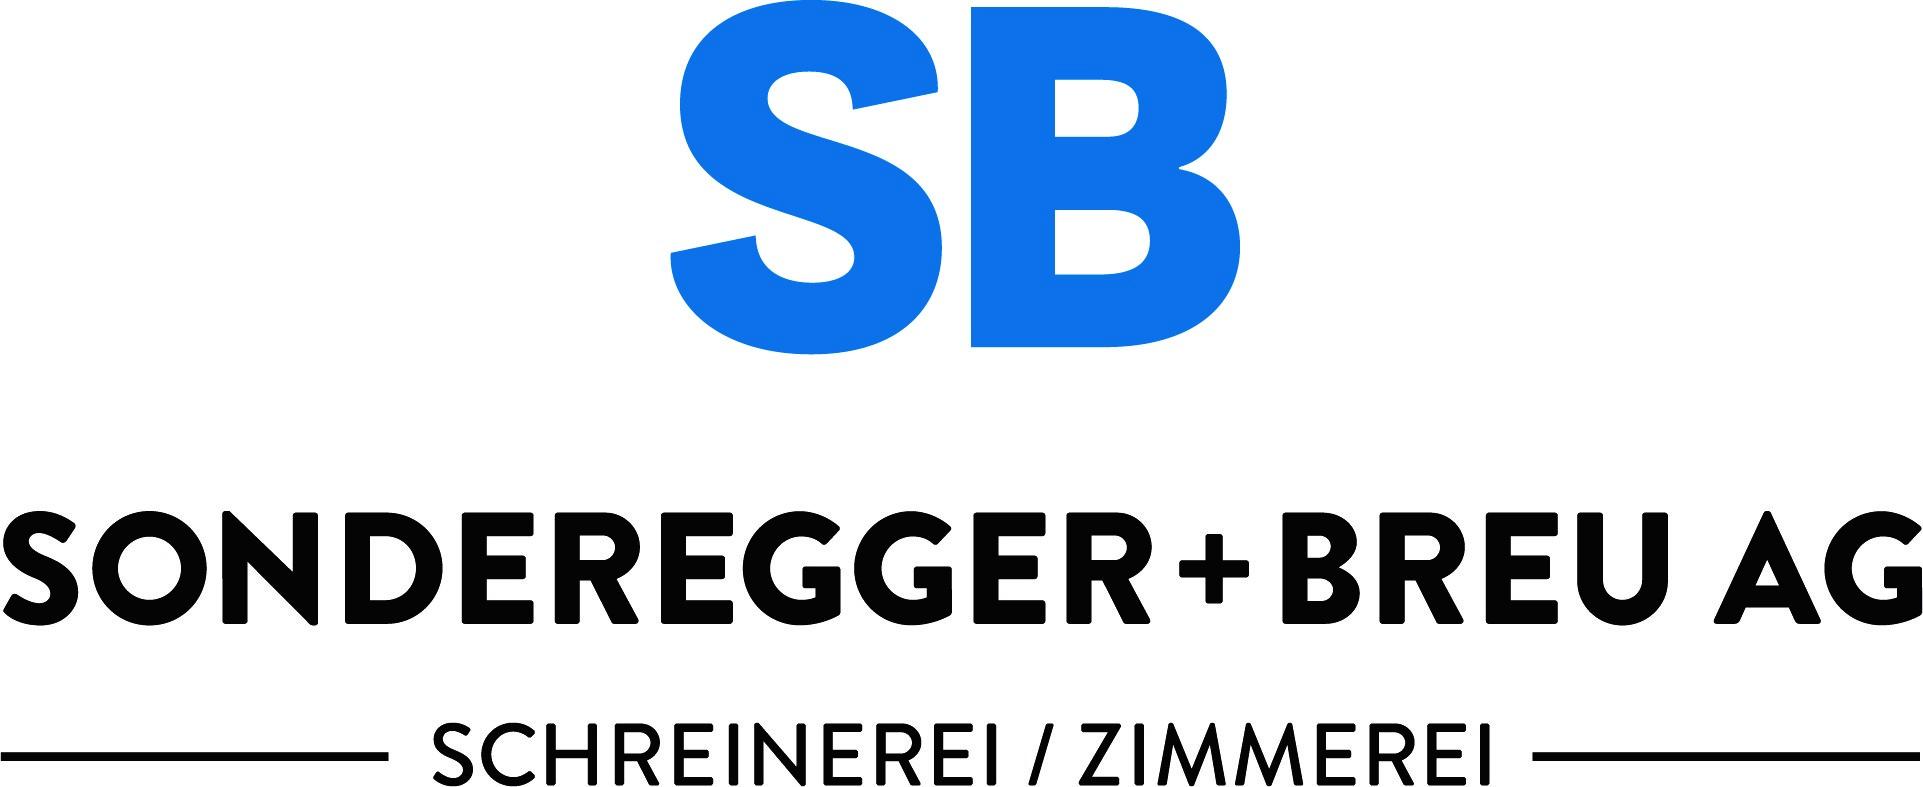 Immagine Sonderegger & Breu AG Schreinerei-Zimmerei